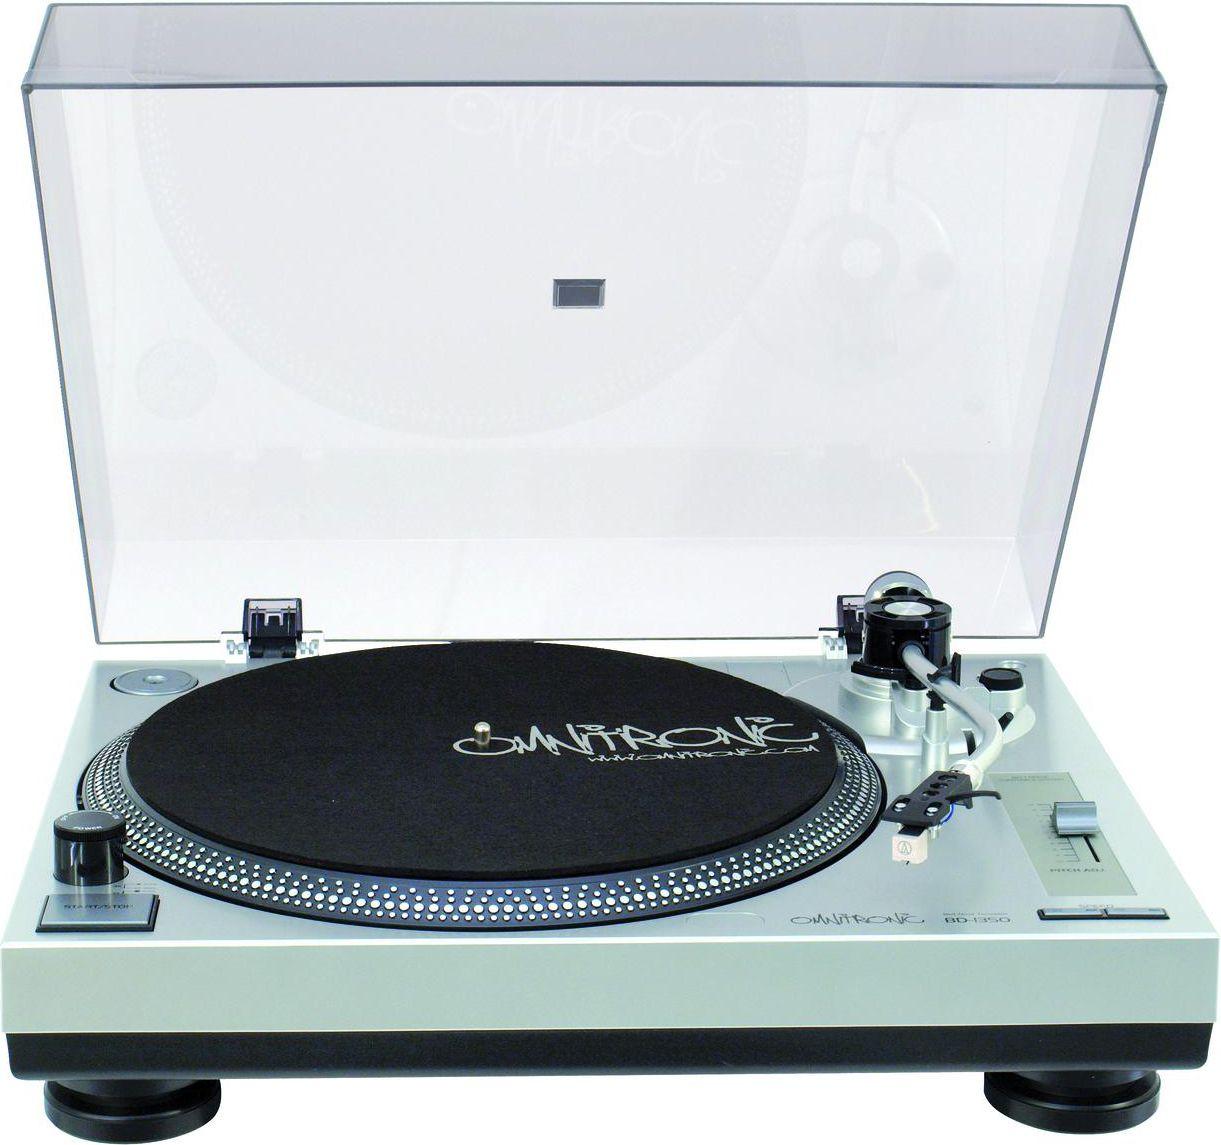 Omnitronic BD-1350 silver radio, radiopulksteņi